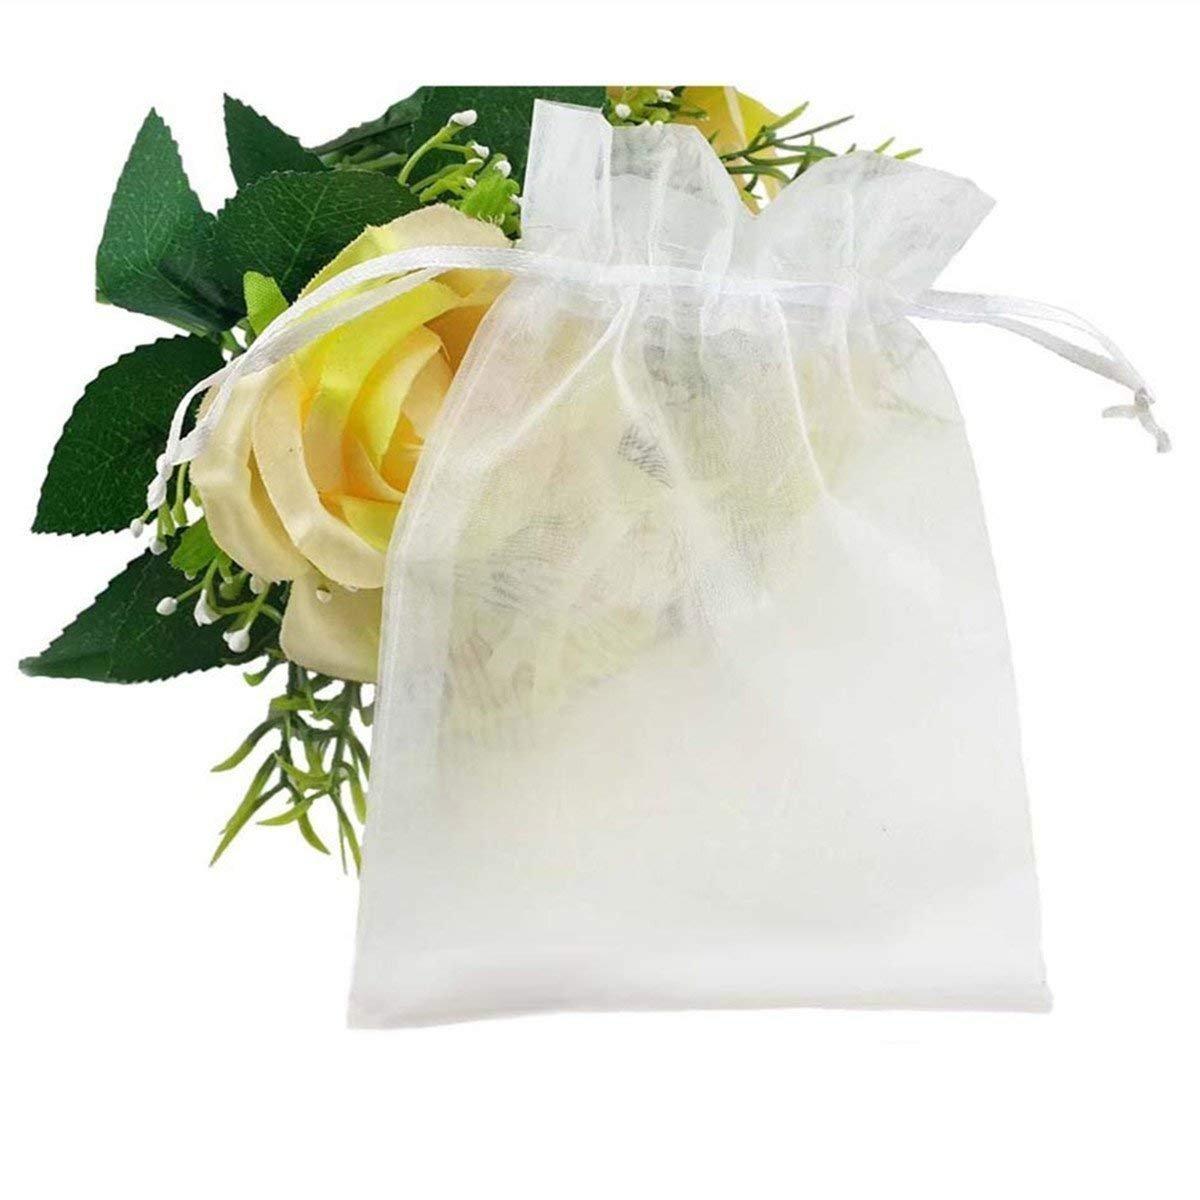 Hilai - 100 bolsas de organza con cordón para joyería, fiesta, boda, regalo, 10 x 12 cm, color blanco